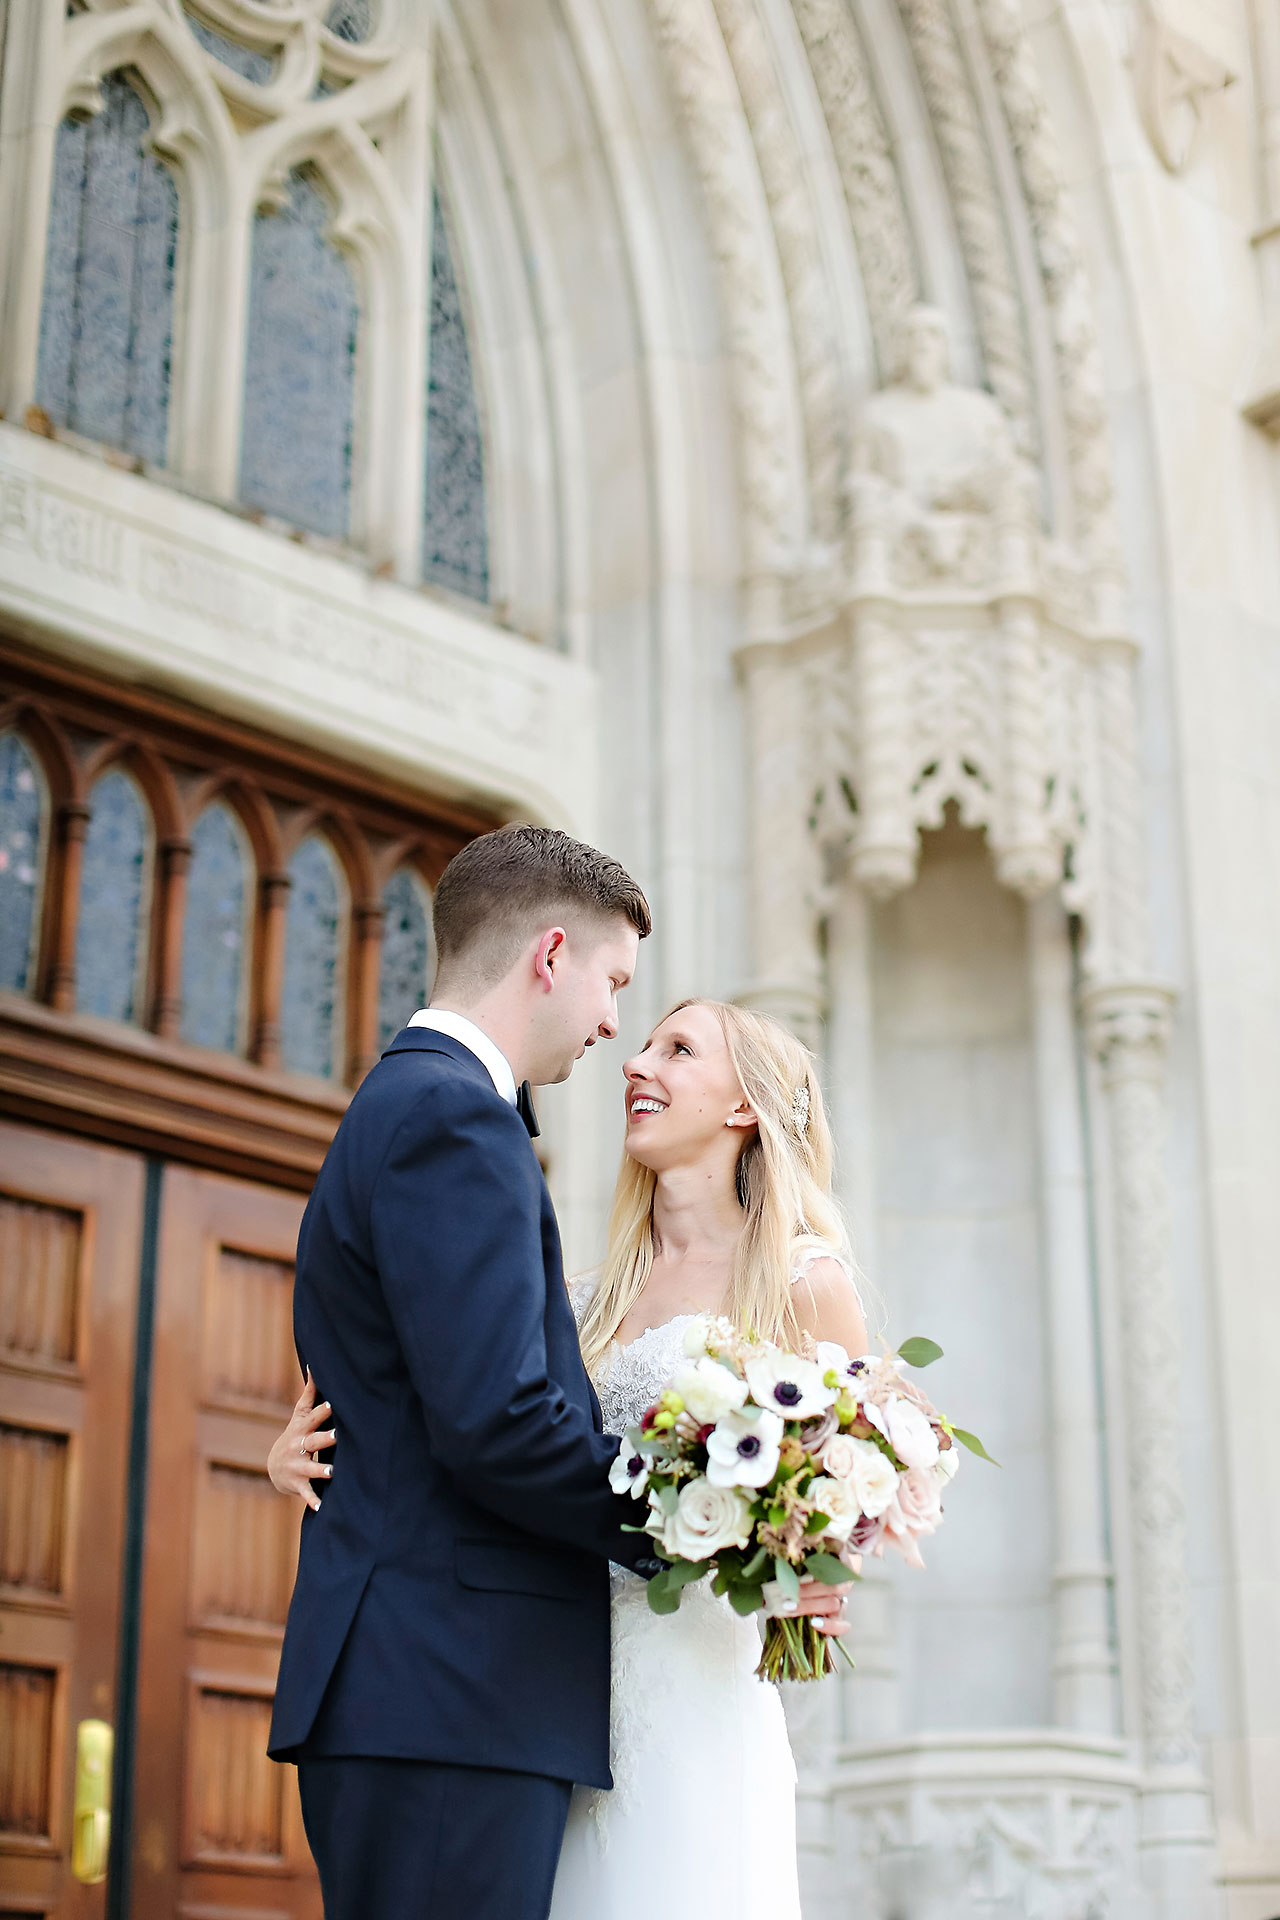 Molly Declan Scottish Rite Indianapolis Wedding 151